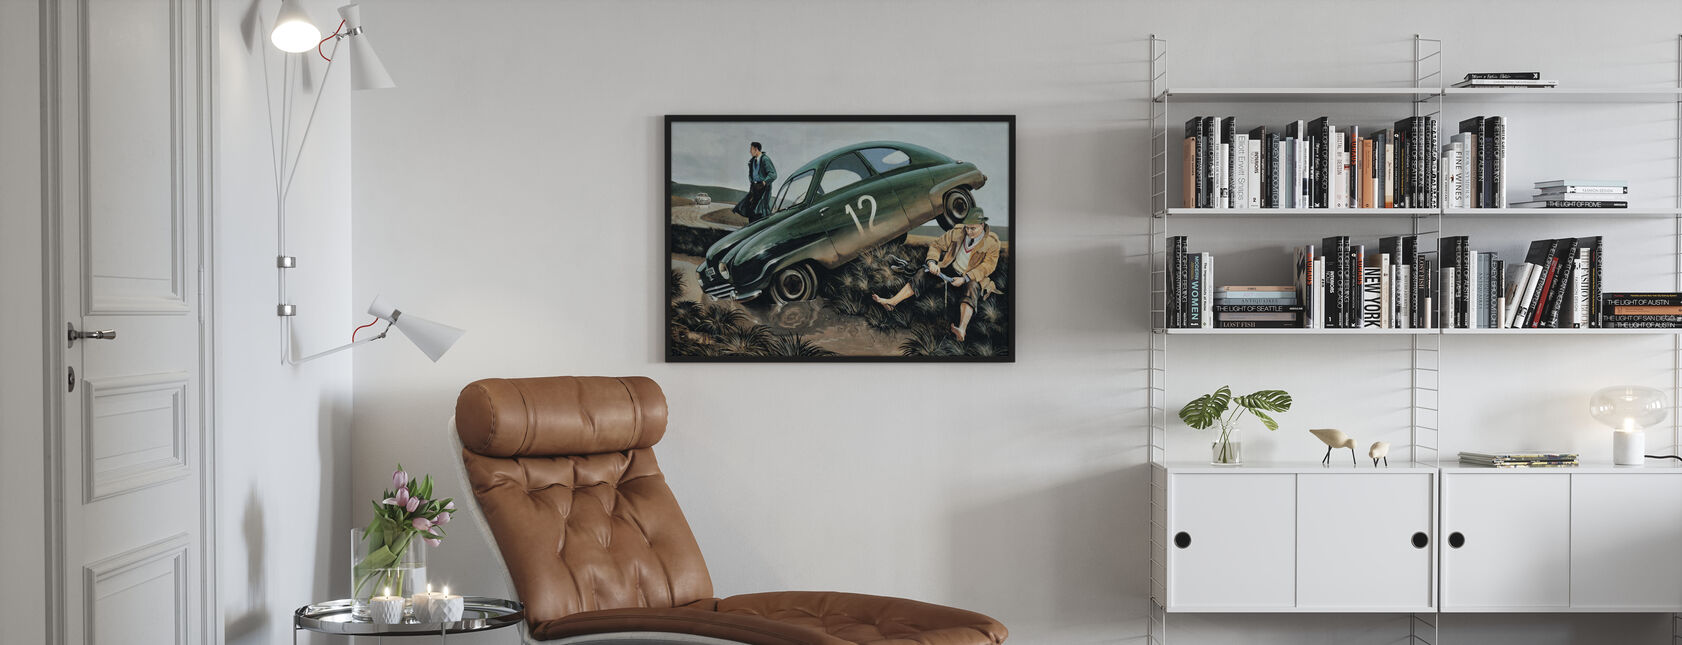 Carlsson bil - Indrammet billede - Stue